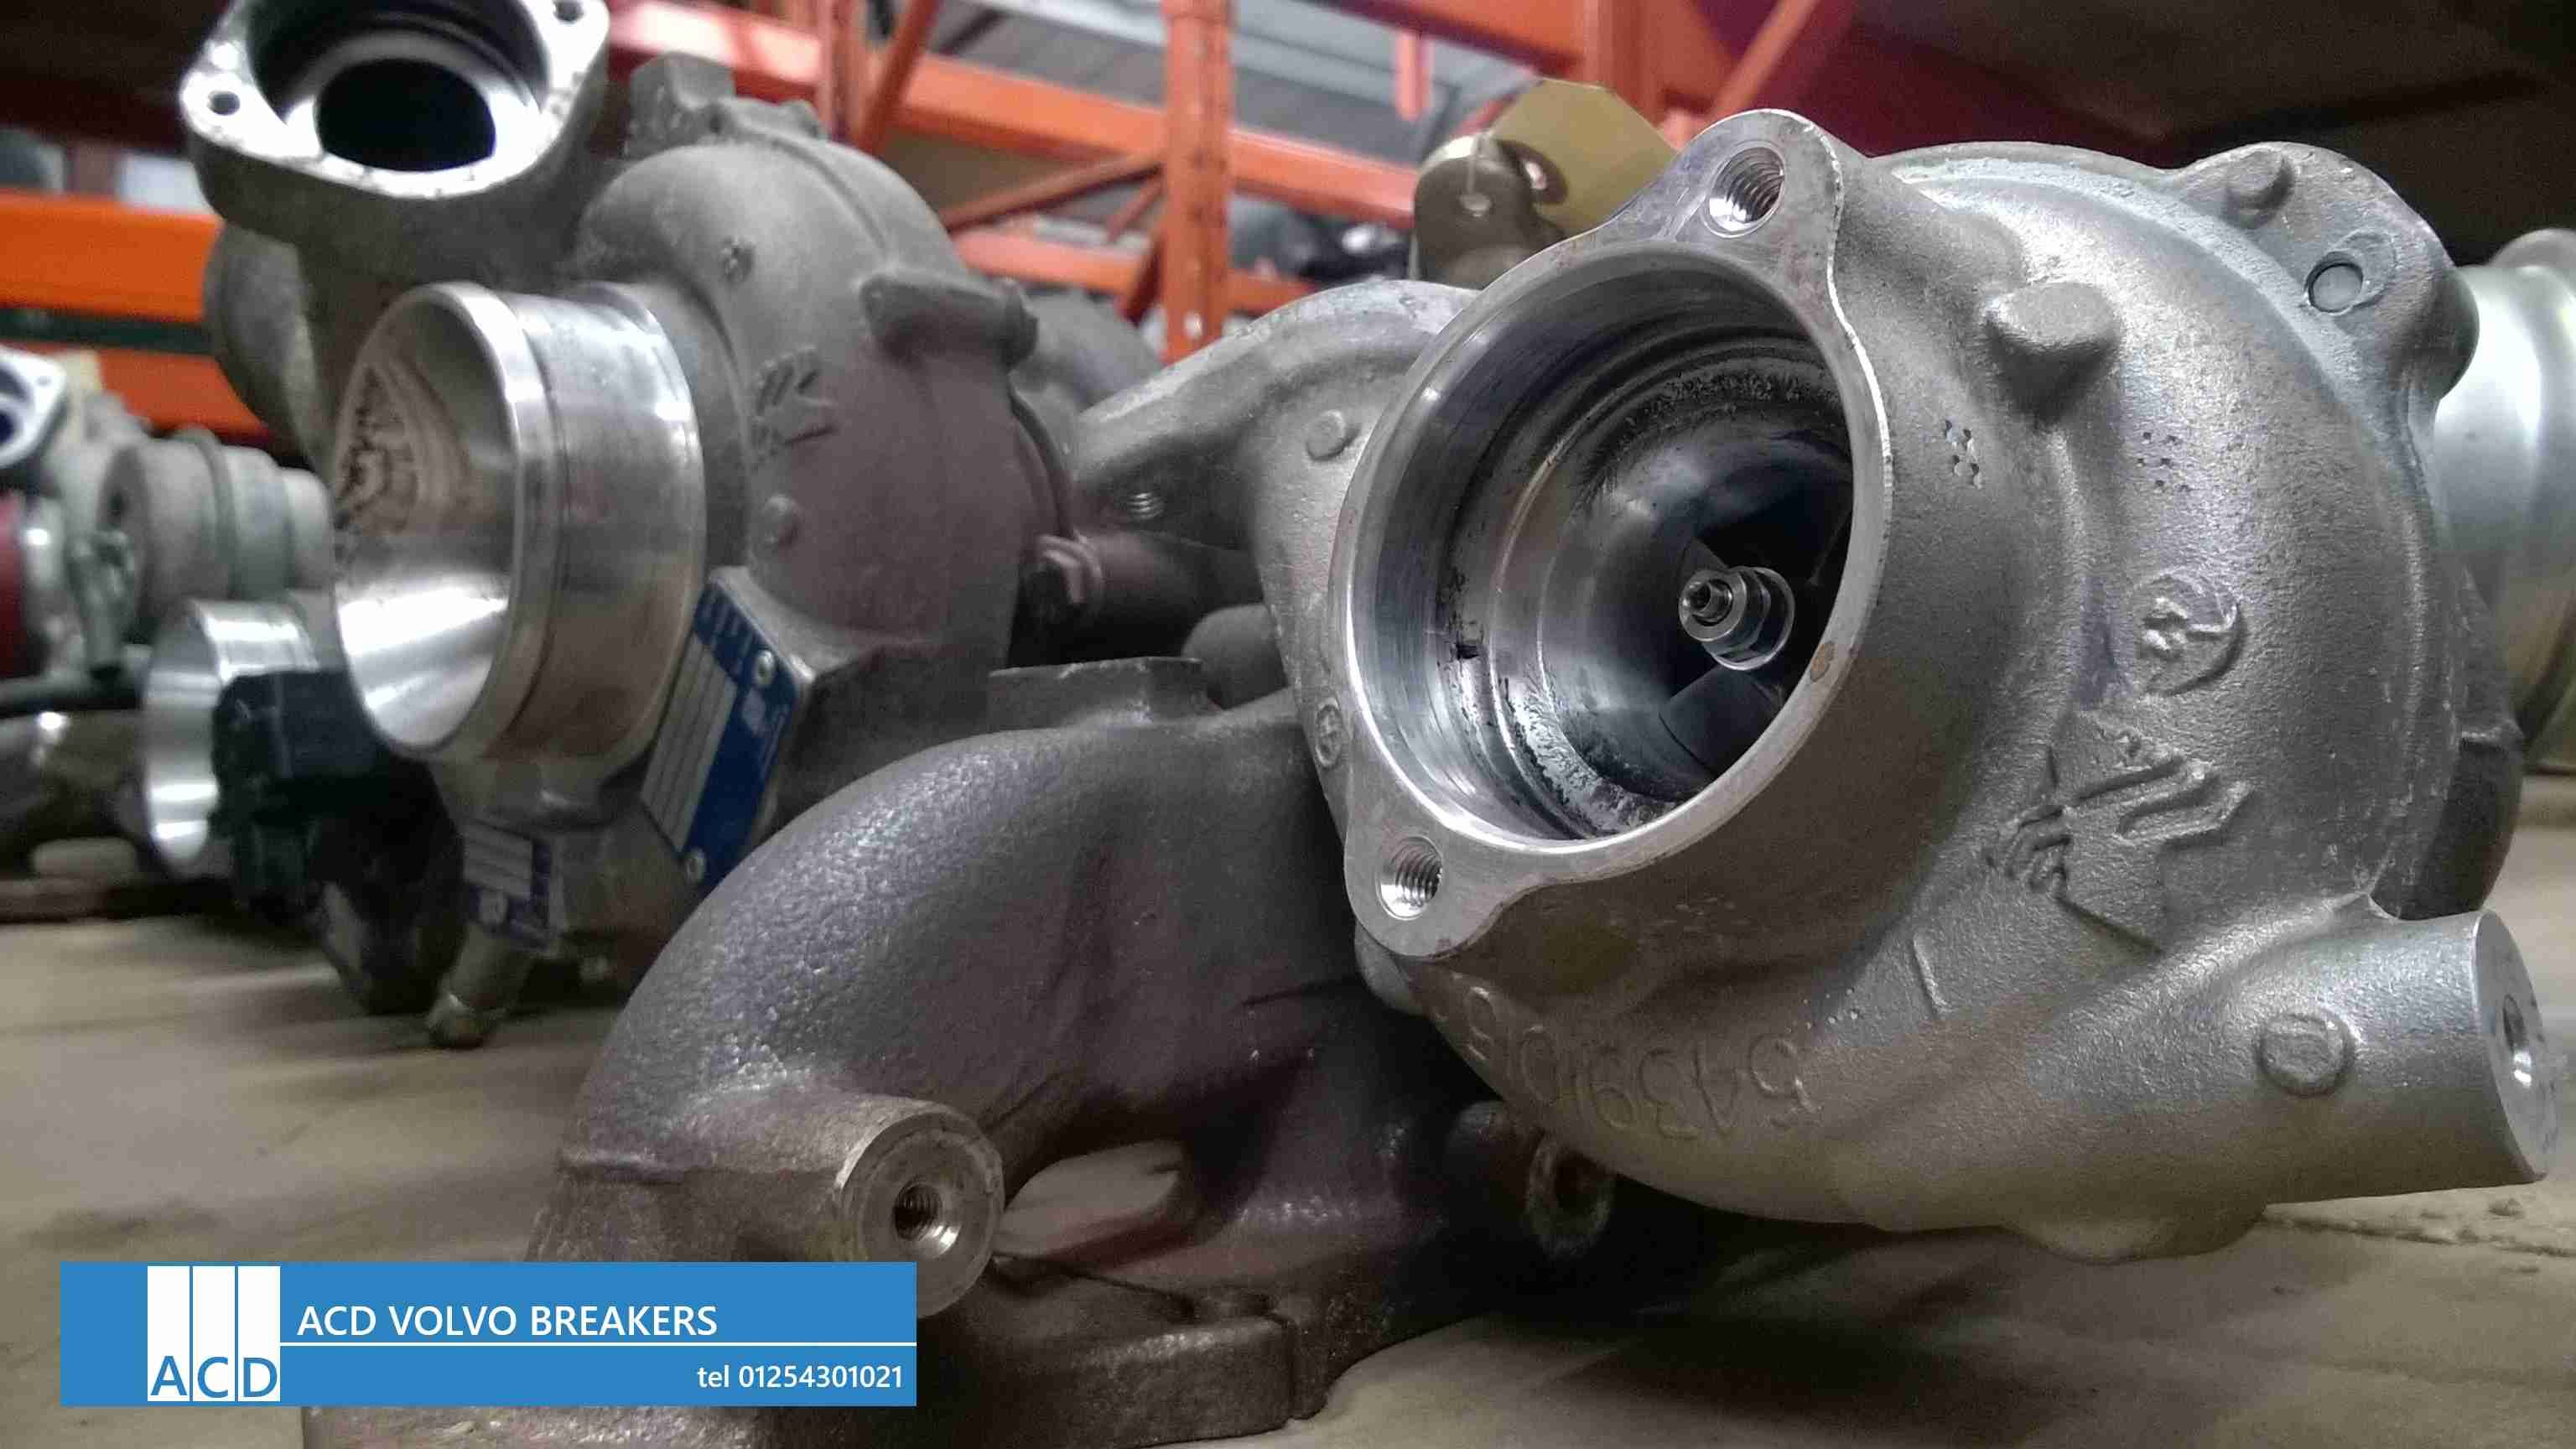 dsc ltd top copy parts sales cheap quality truckbreak volvo trucks used export